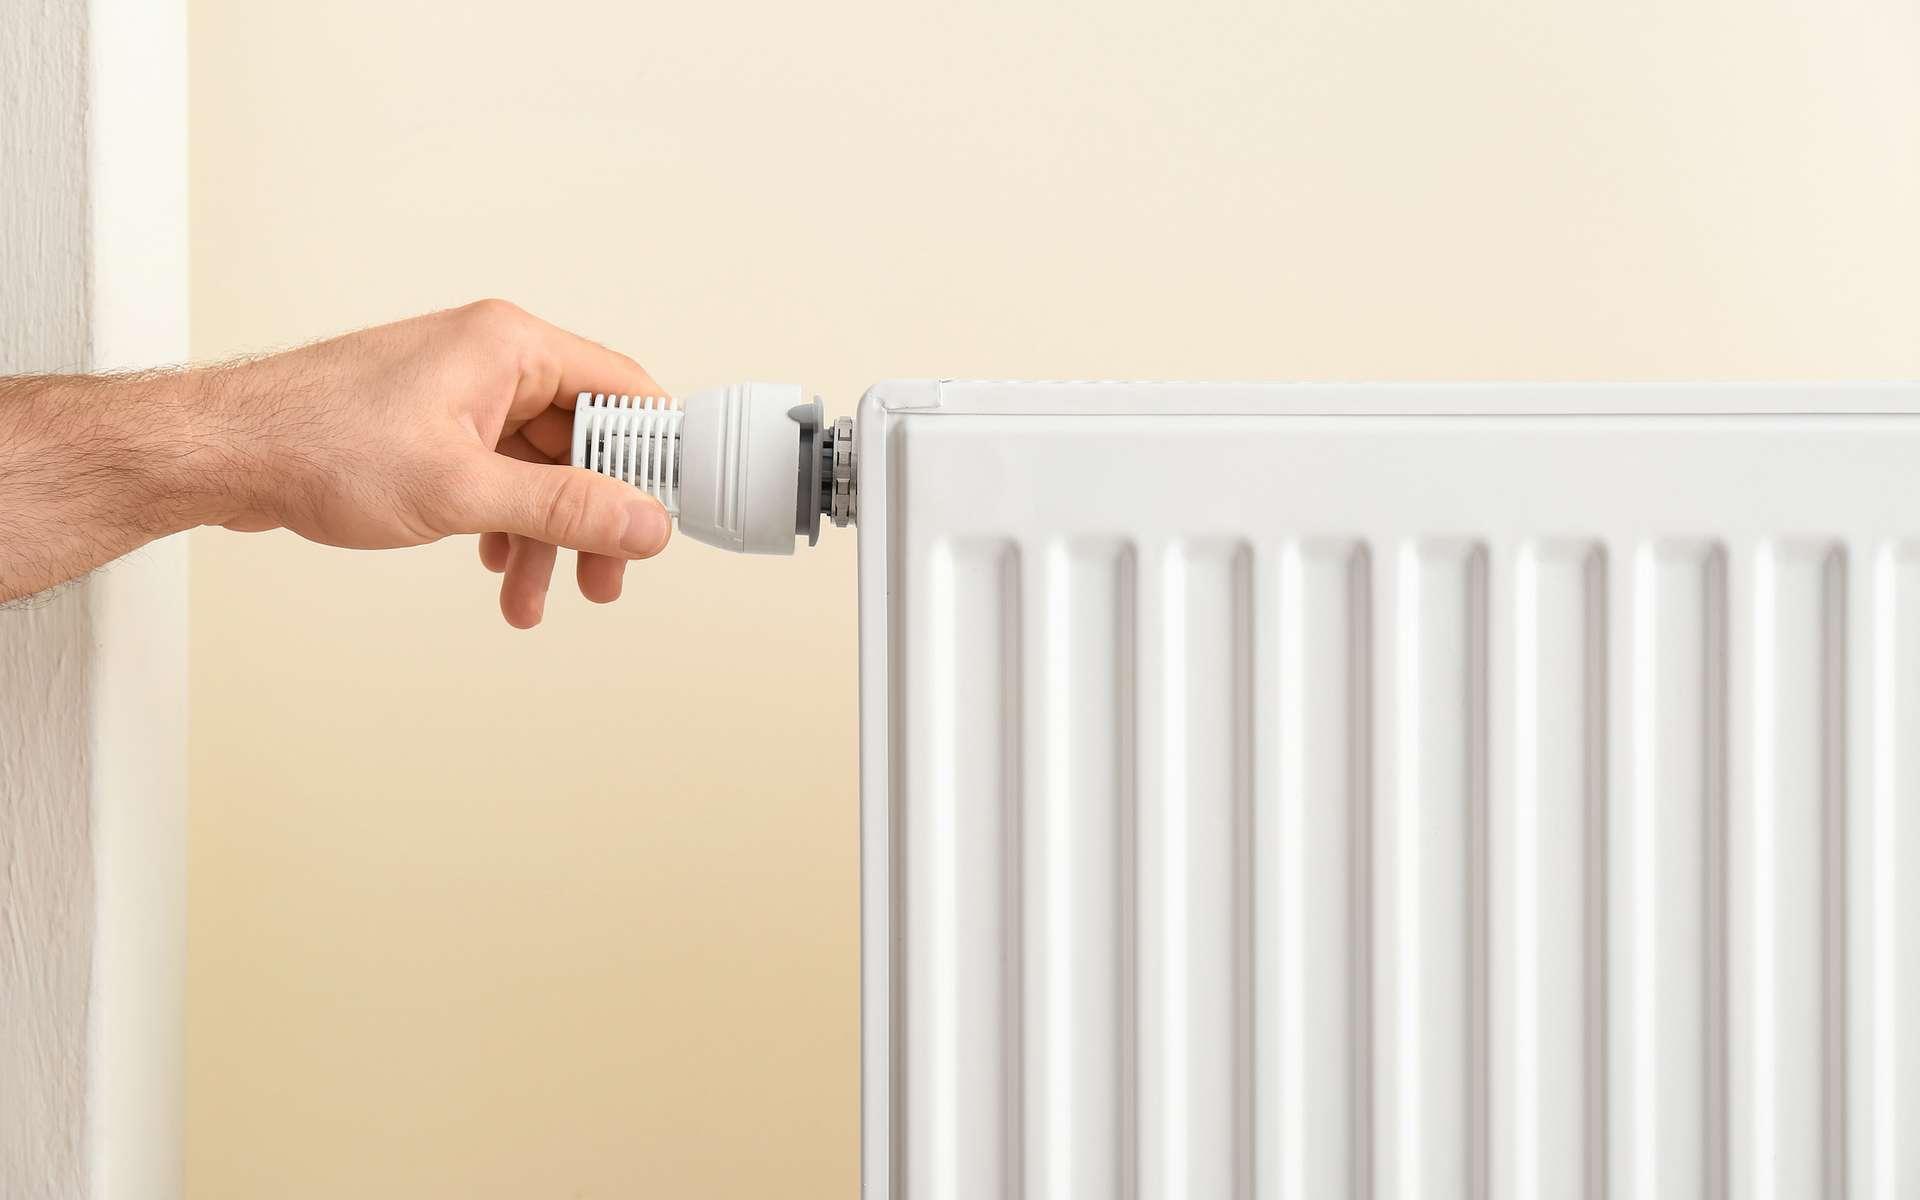 Installation de radiateur électrique © New Africa, AdobeStock